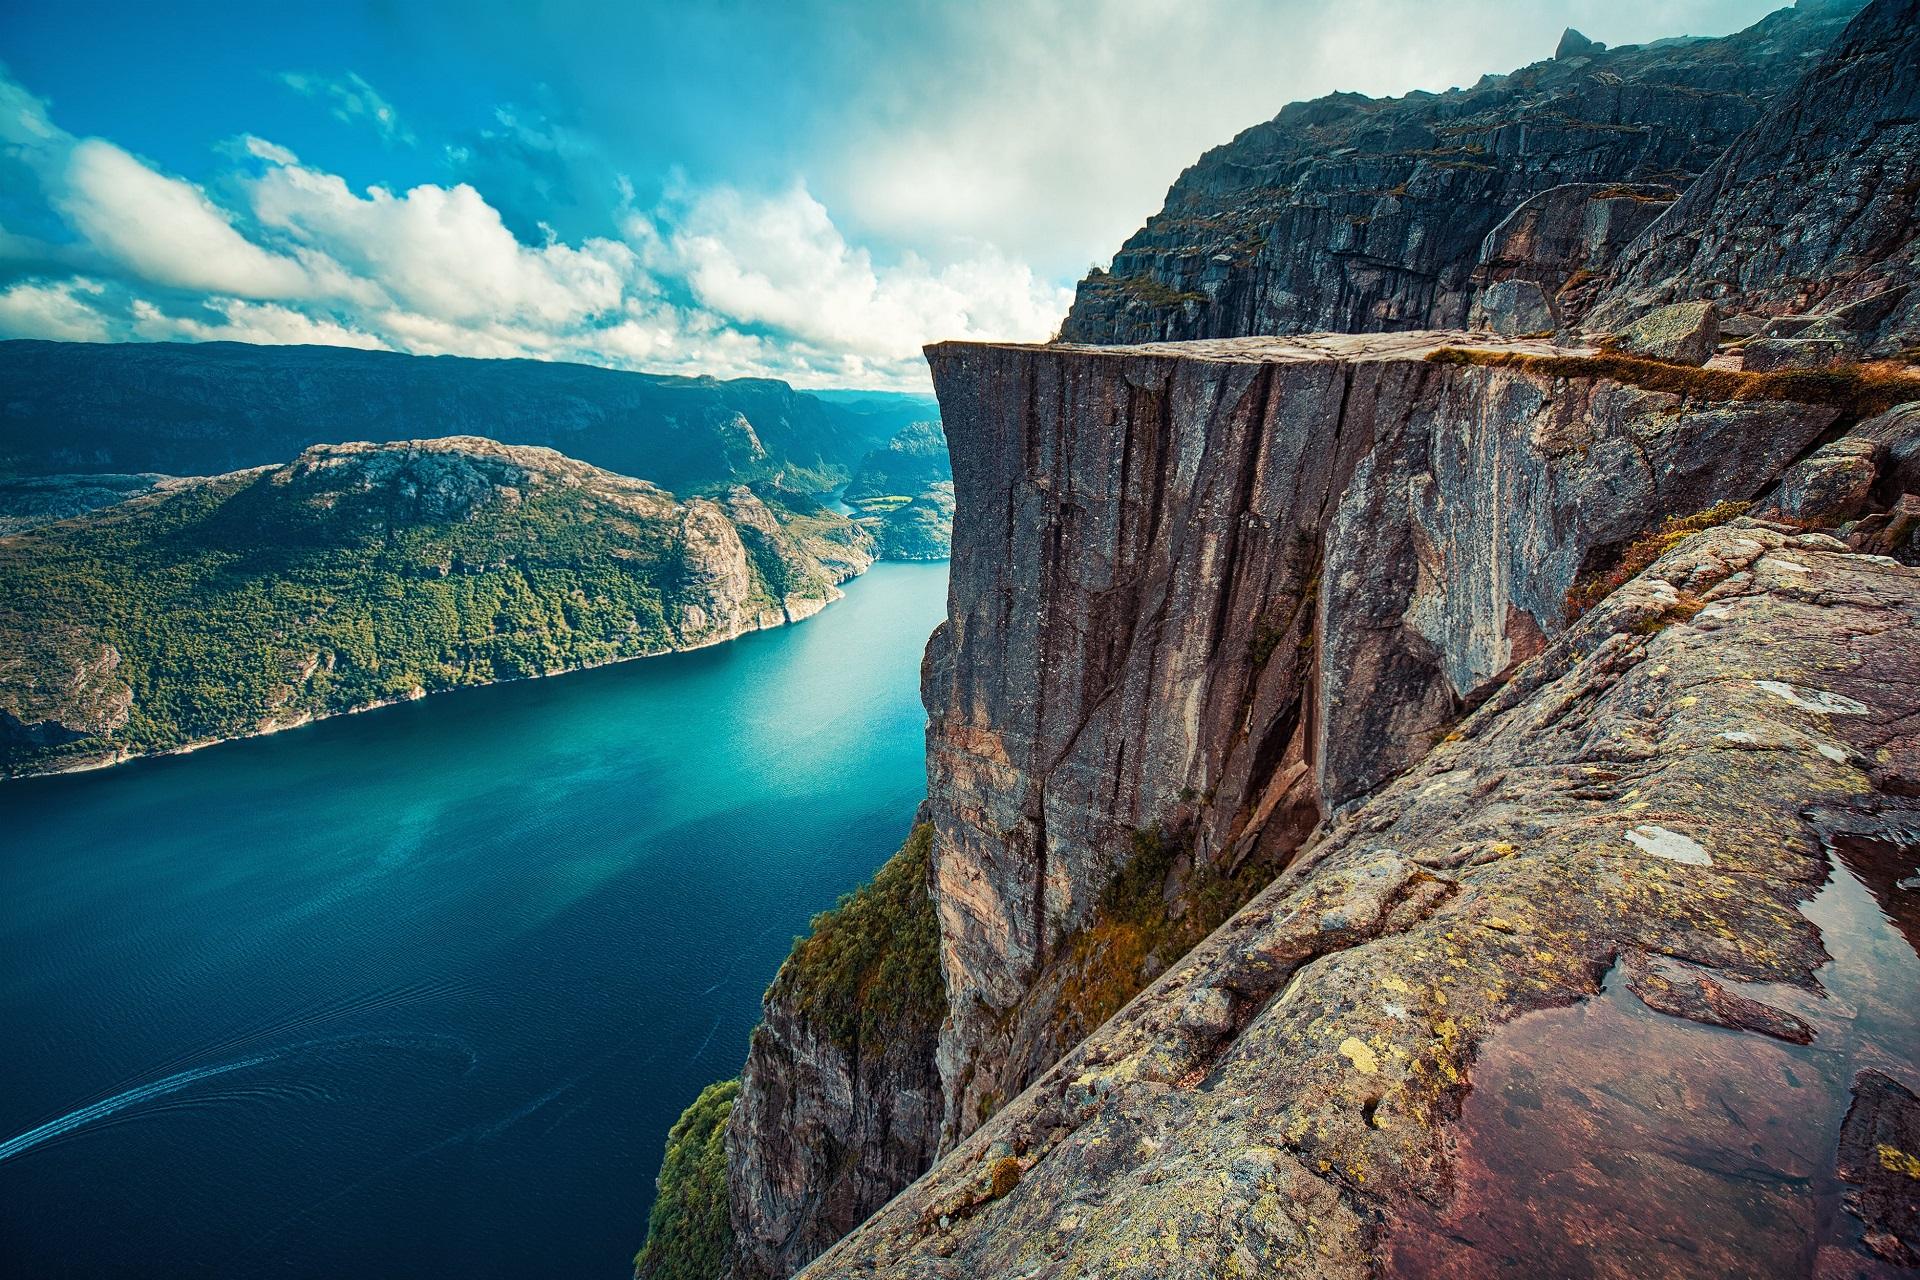 Lysefjord_647002174-min